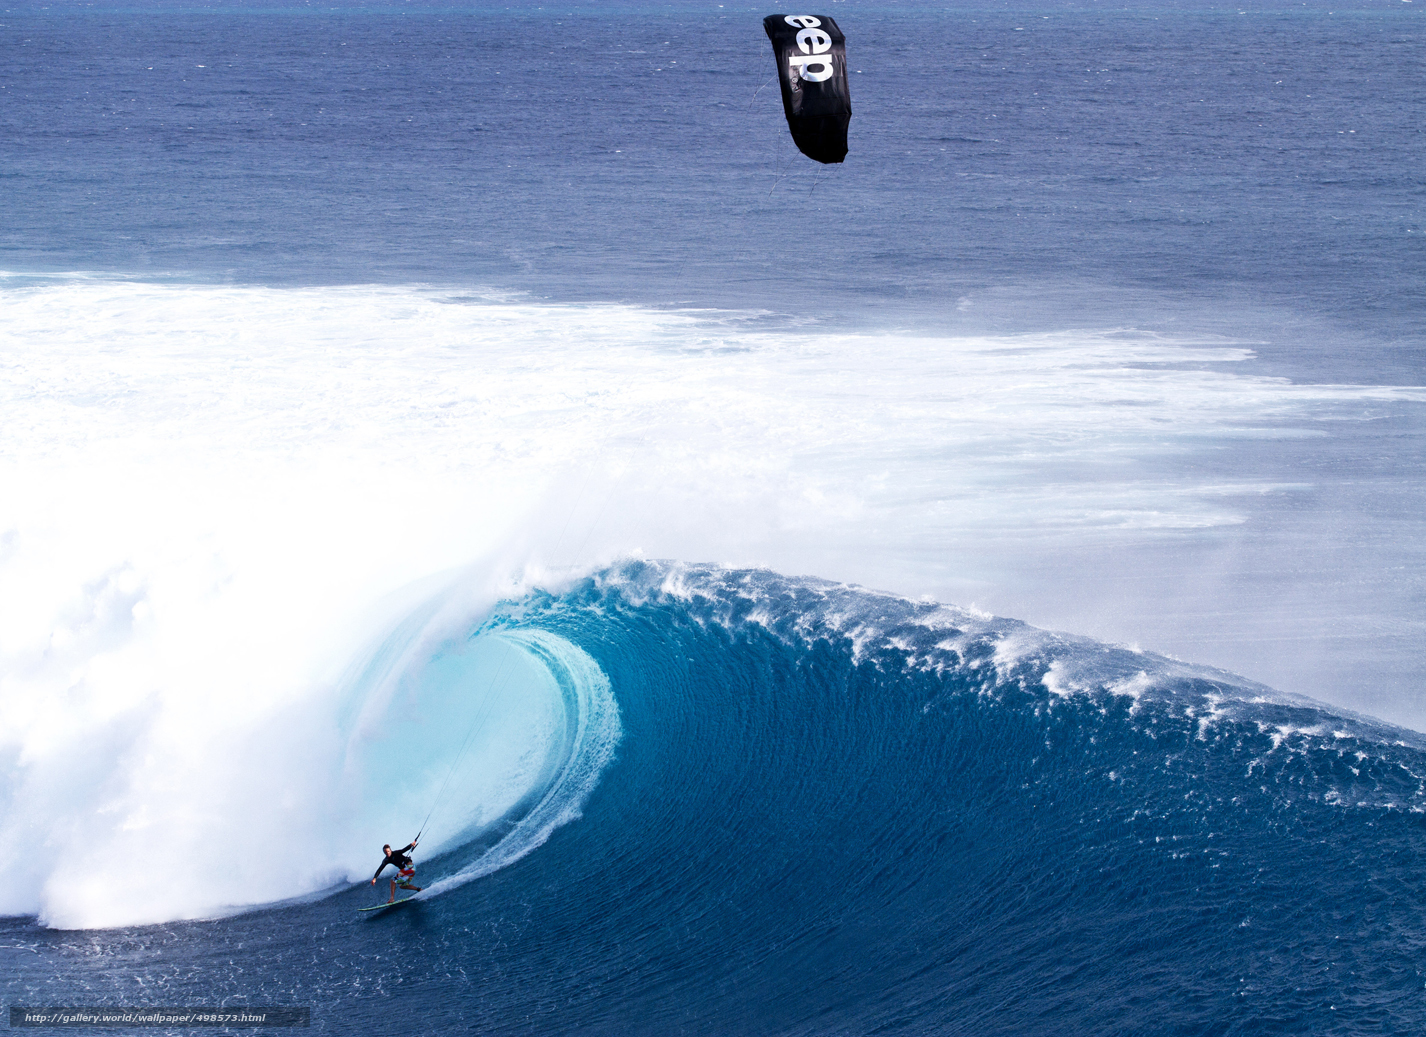 Download wallpaper Maldives, tropics, Wave, Kitesurfing free desktop wallpaper in the resolution ...